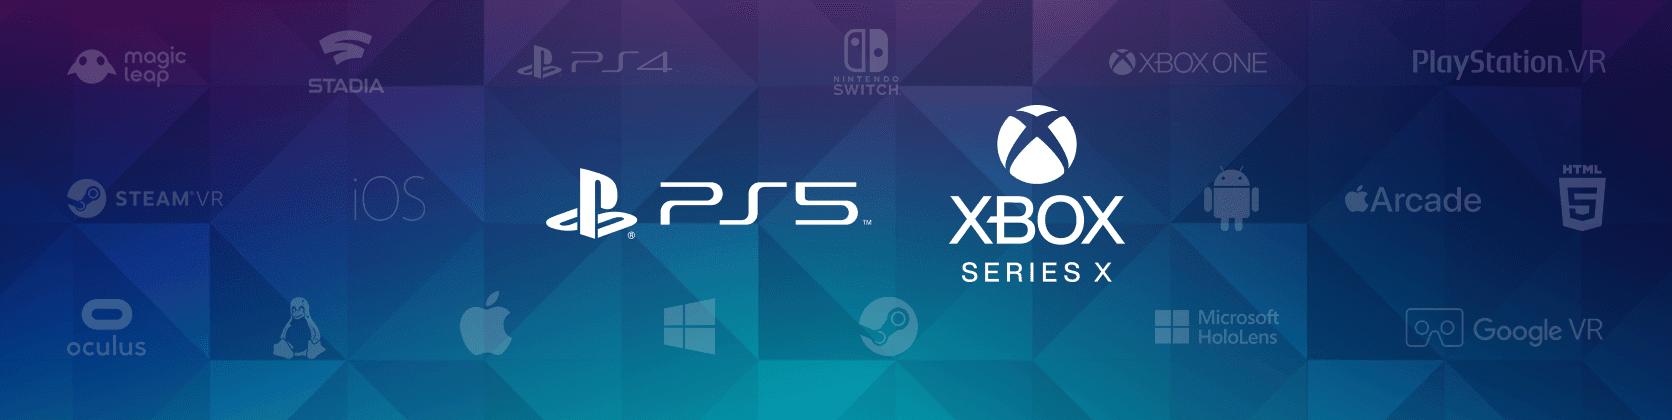 Unreal engine: plataforma agora suporta playstation 5 e xbox series x   1d4d4f83 image 1   married games notícias, tecnologia   unreal engine